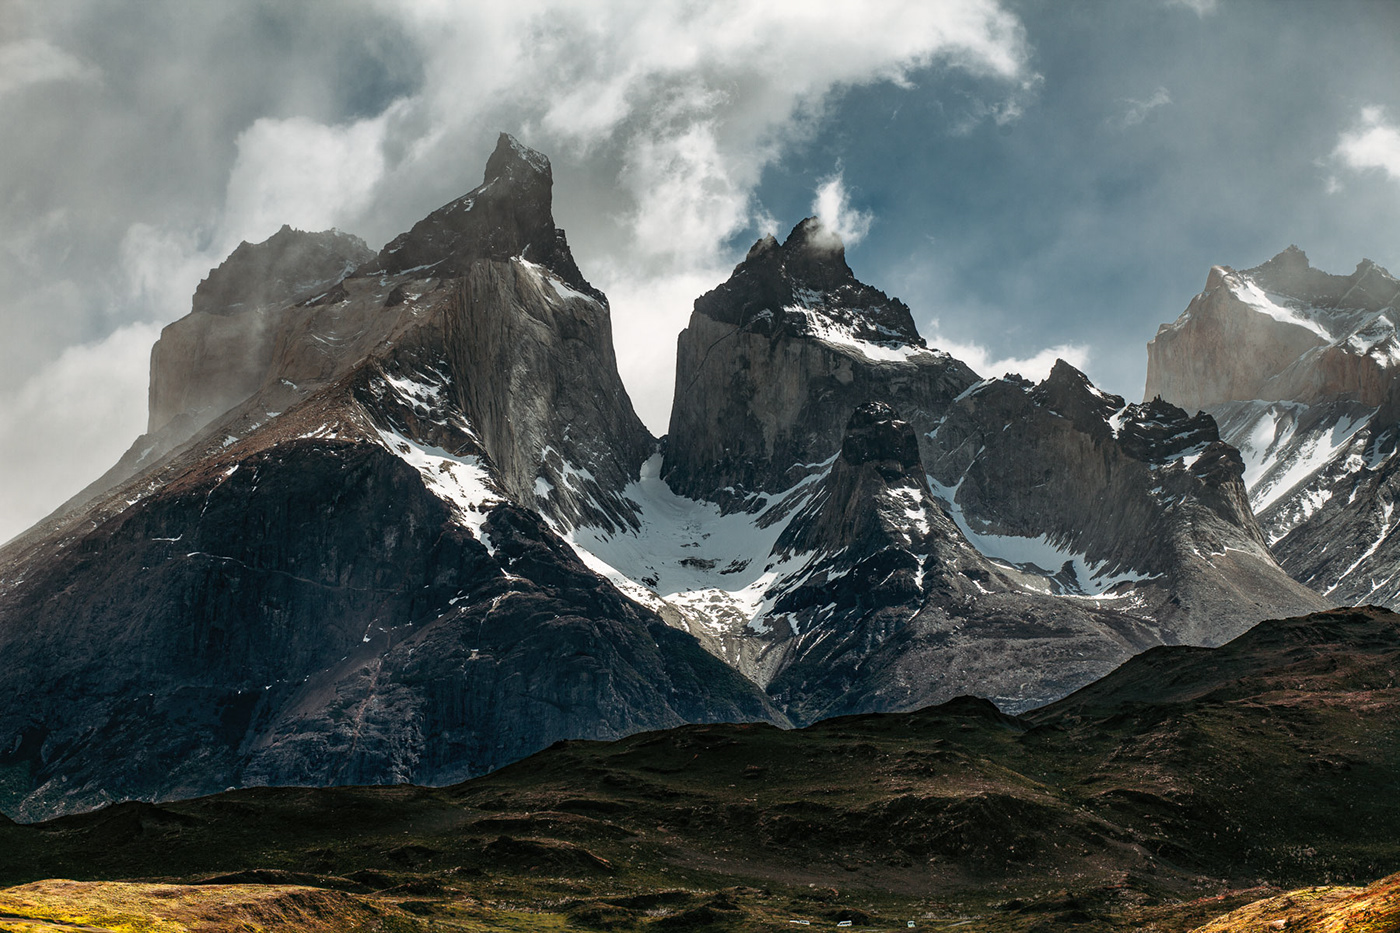 adventure chile glacier Landscape mountains Outdoor patagonia torres del paine